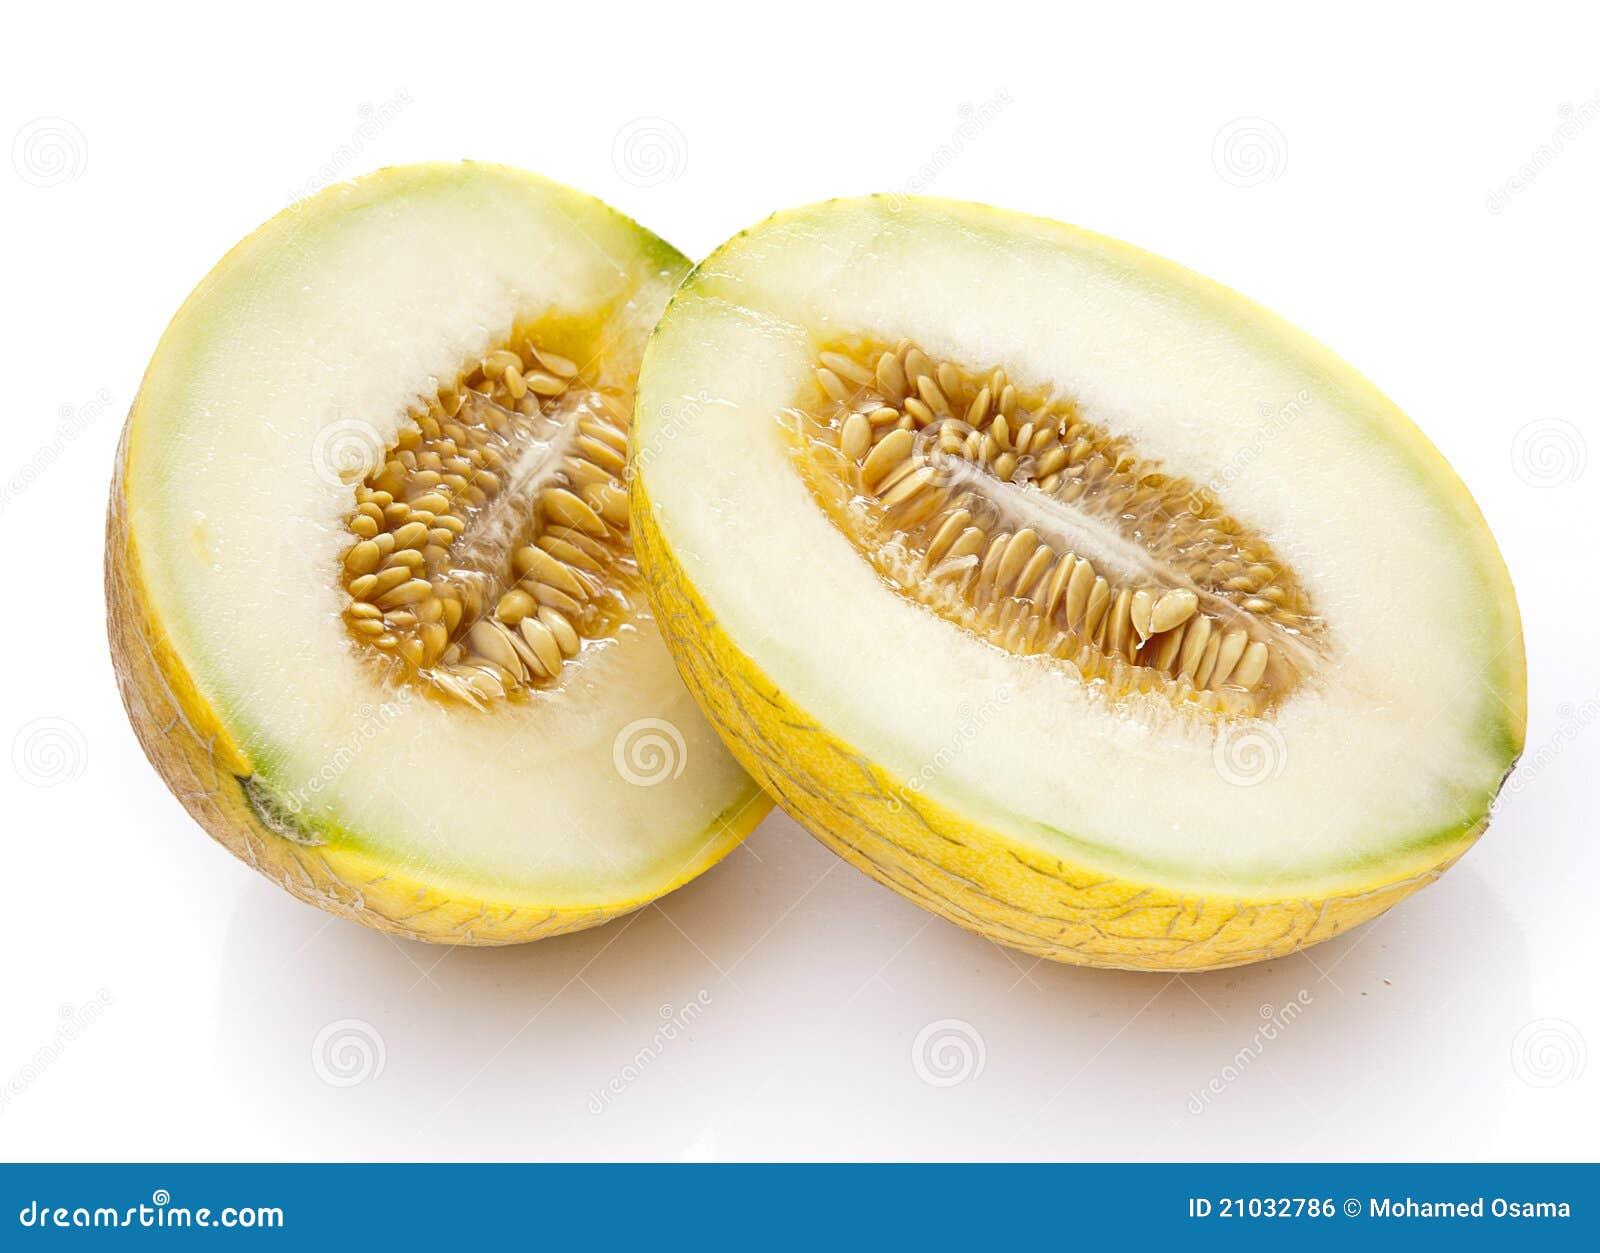 Cut Open Melon